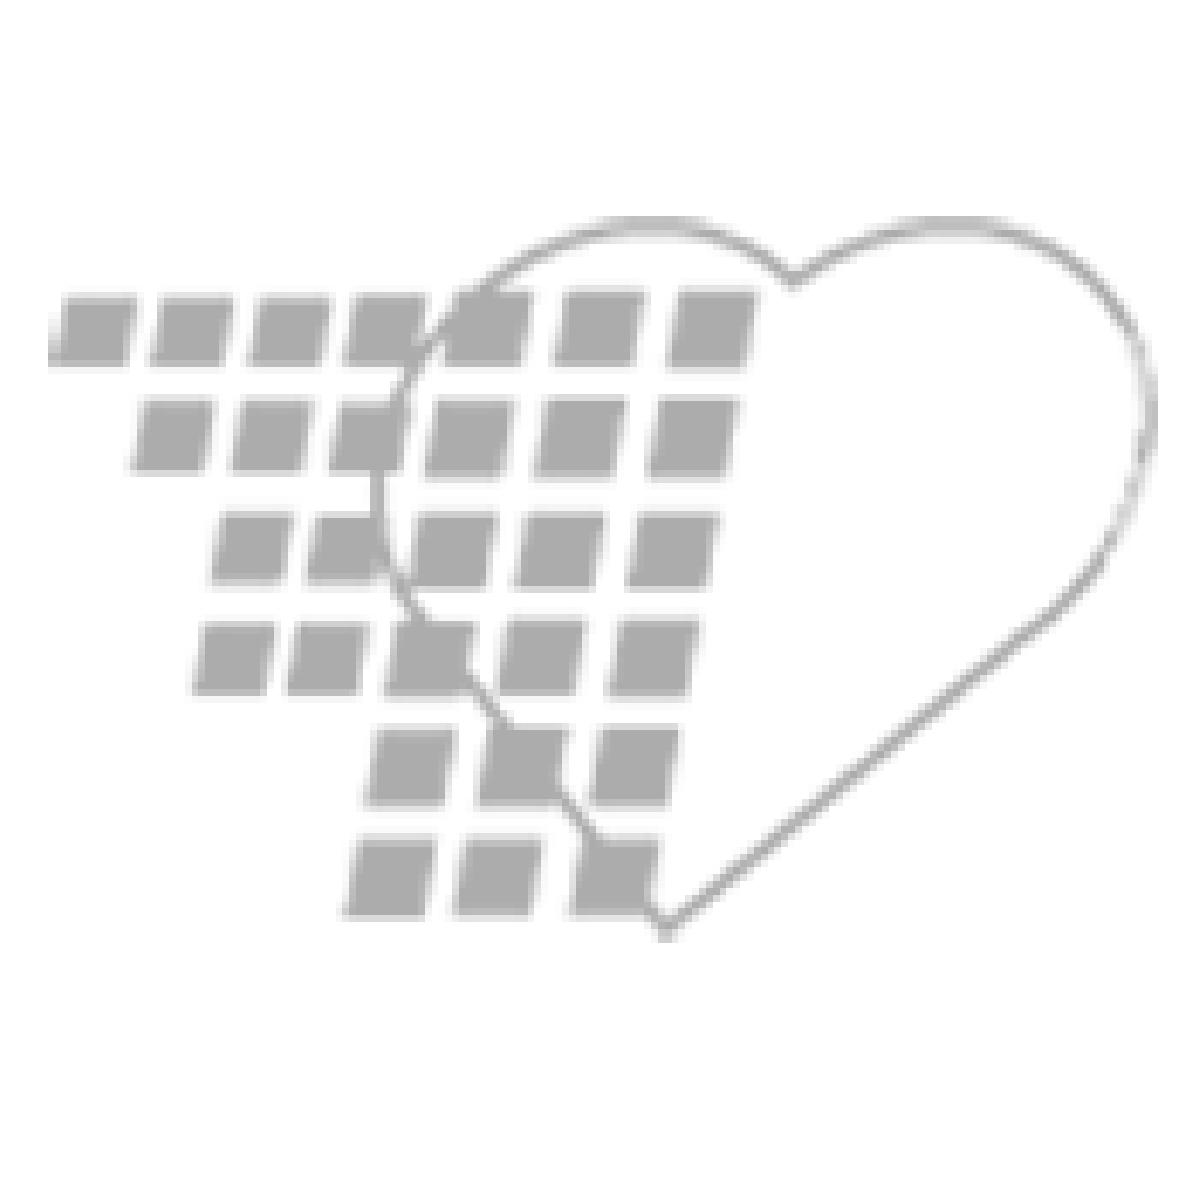 05-46-1500 Pocket Nurse® Simulated Silicone GTube - 16 Fr